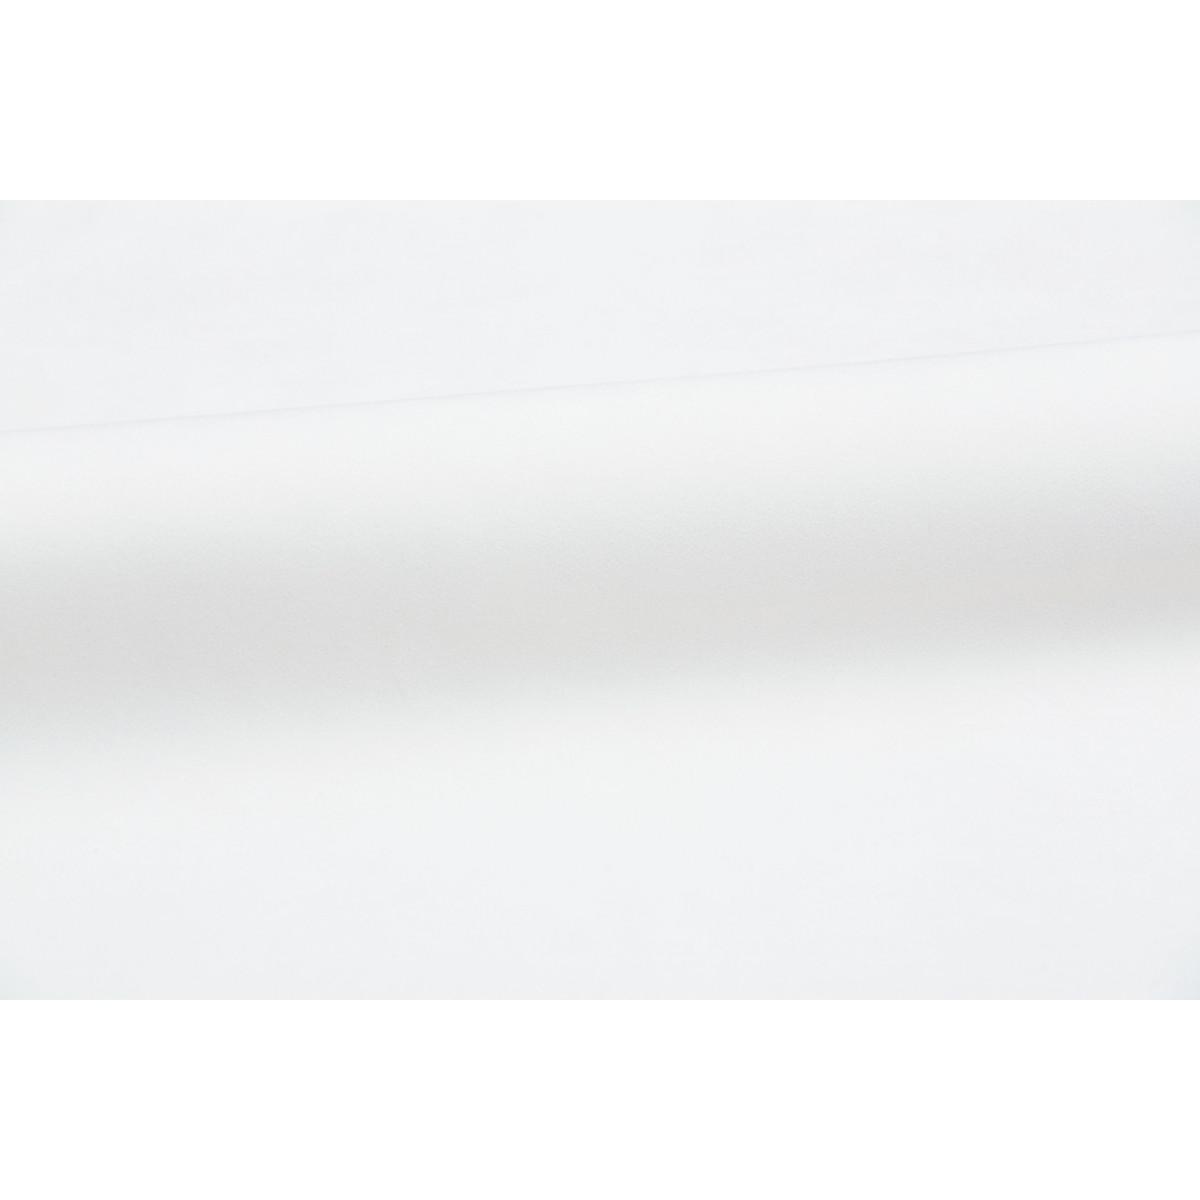 S112-K00-S-B07 Кровать с мягким изголовьем 120*200 коллекция Silvery Rome